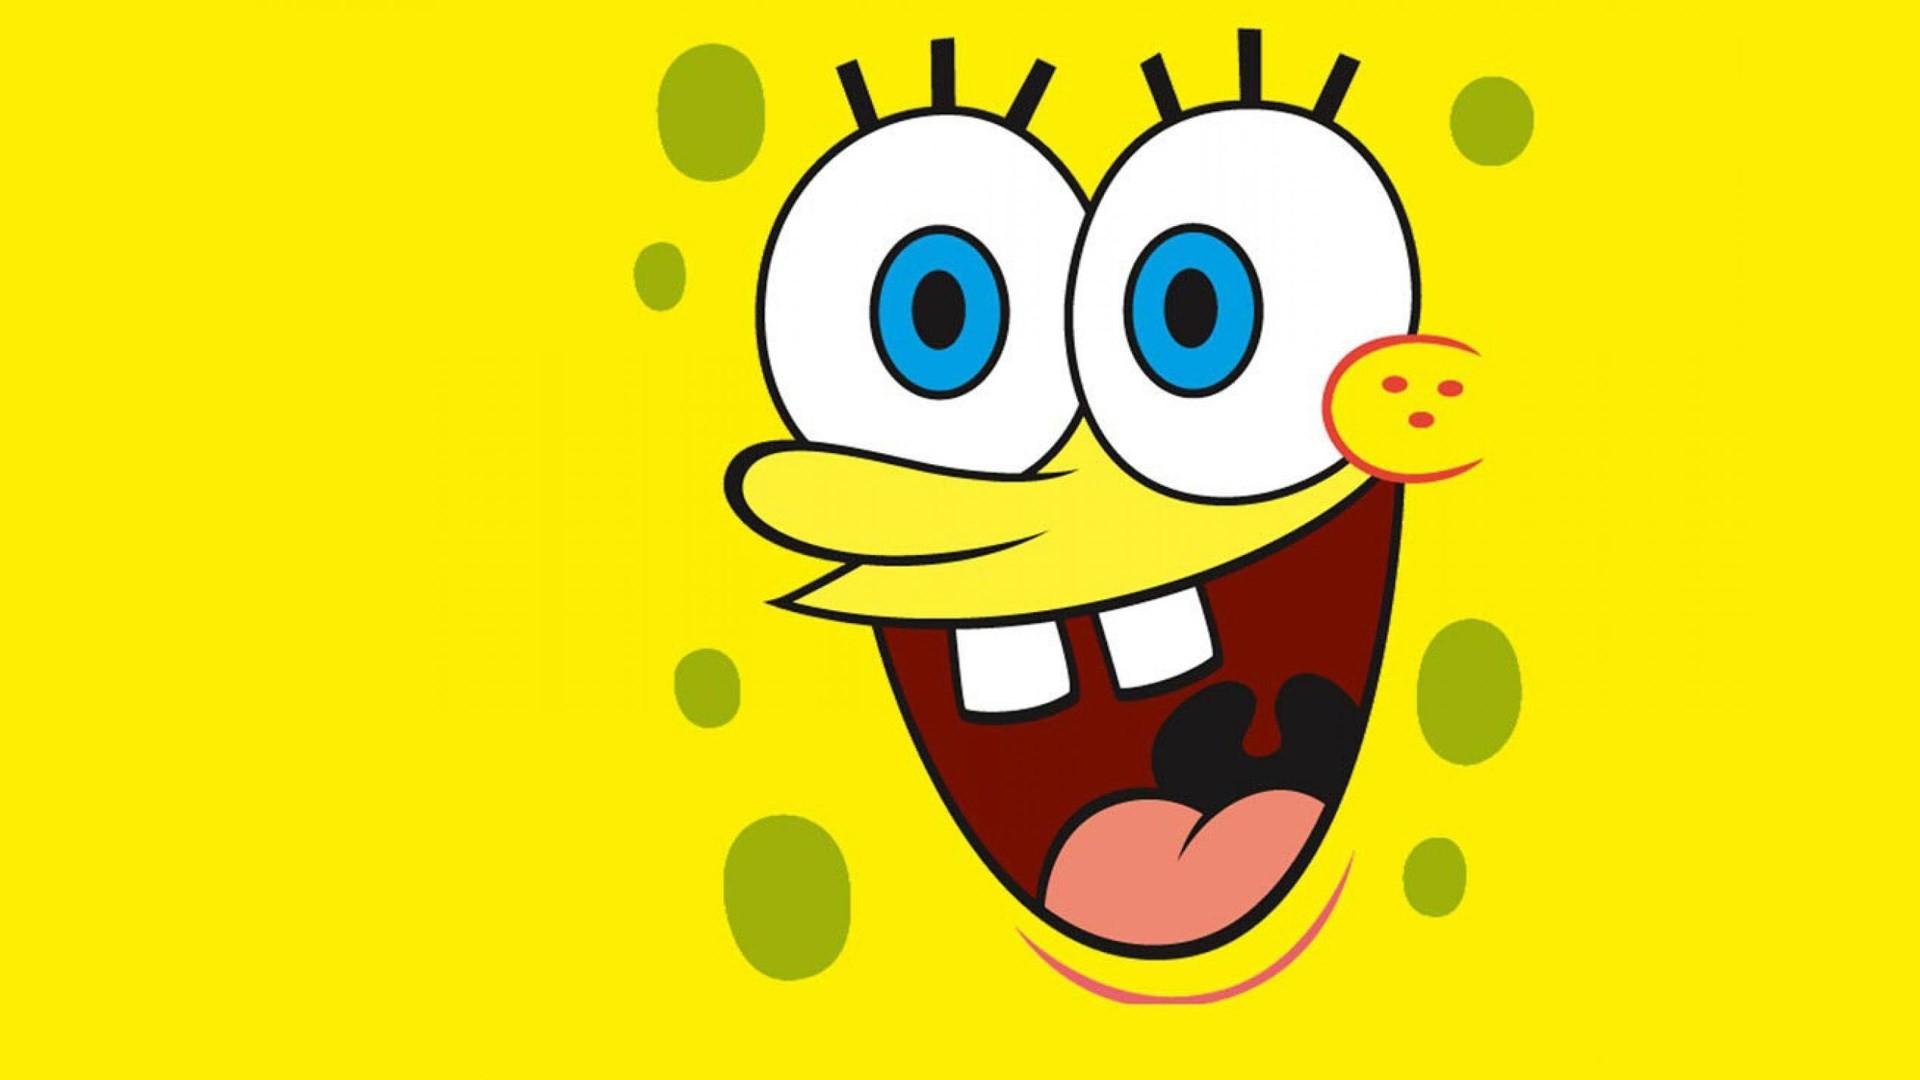 spongebob backgrounds for widescreen, 1920 x 1080 (86 kB) | ololoshka |  Pinterest | Spongebob